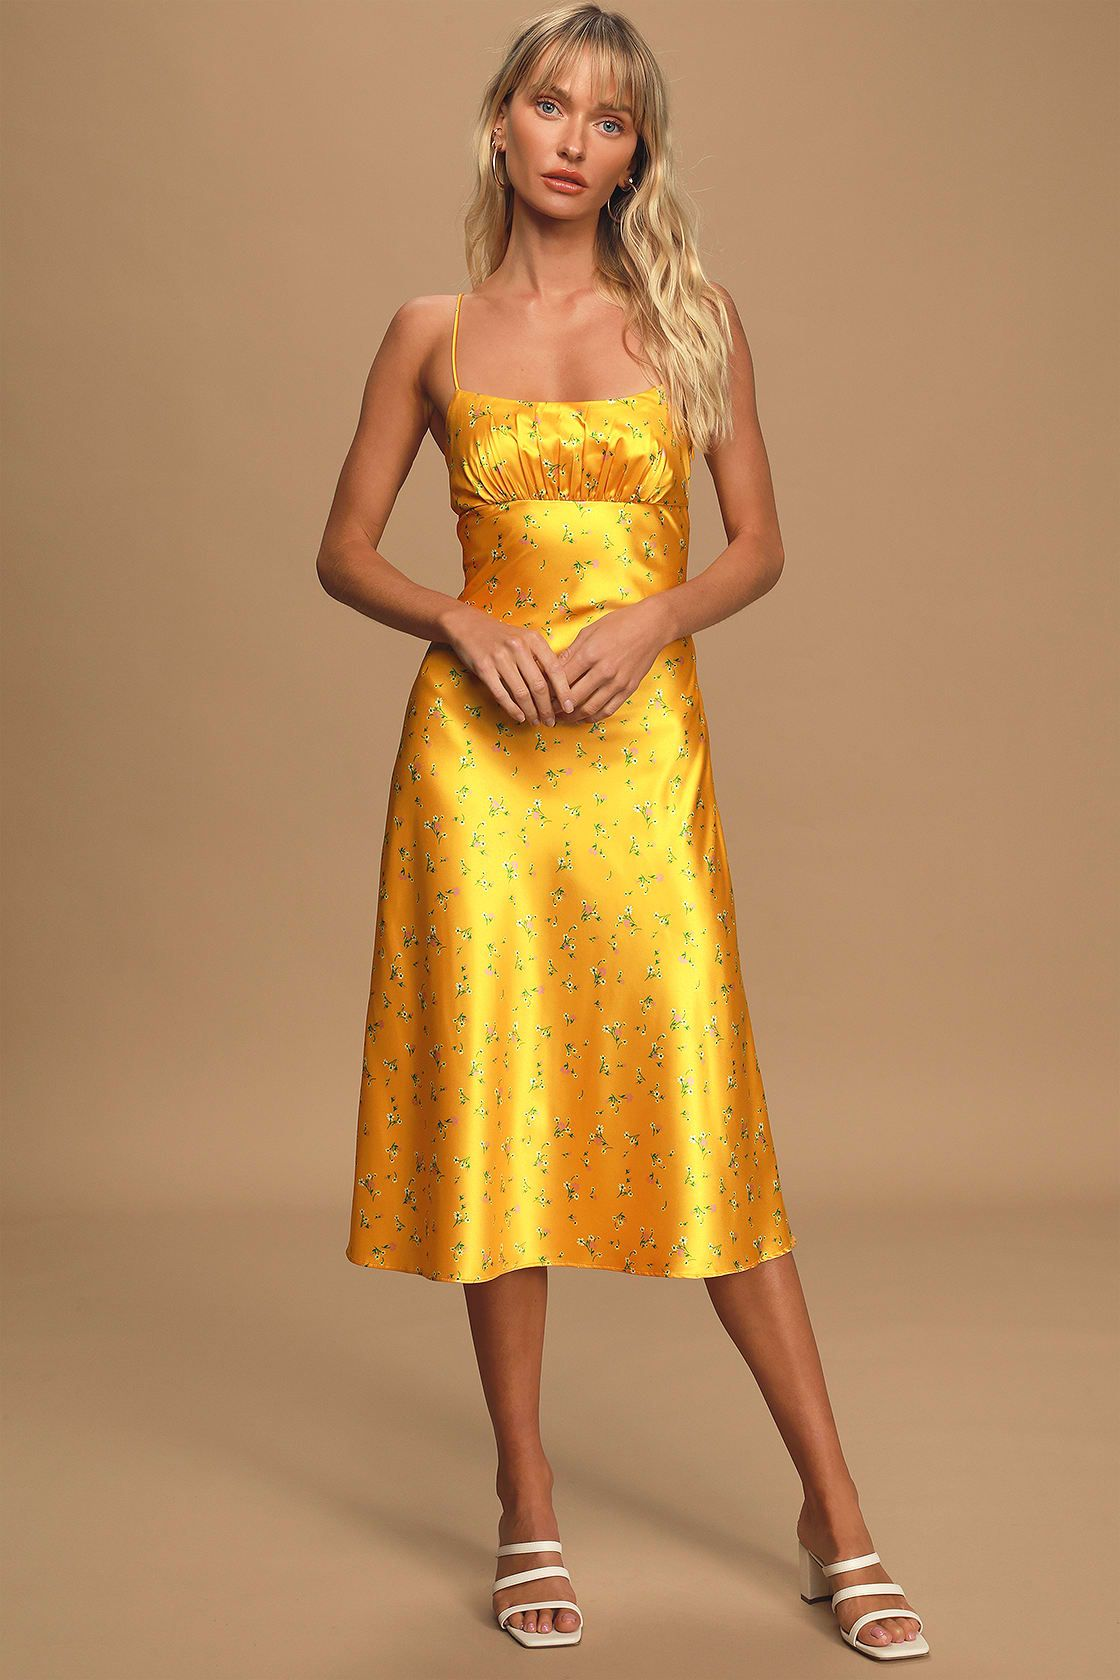 Rachel Yellow Floral Print Satin Midi Dress Satin Midi Dress Yellow Lace Dresses Satin Slip Dress [ 1680 x 1120 Pixel ]